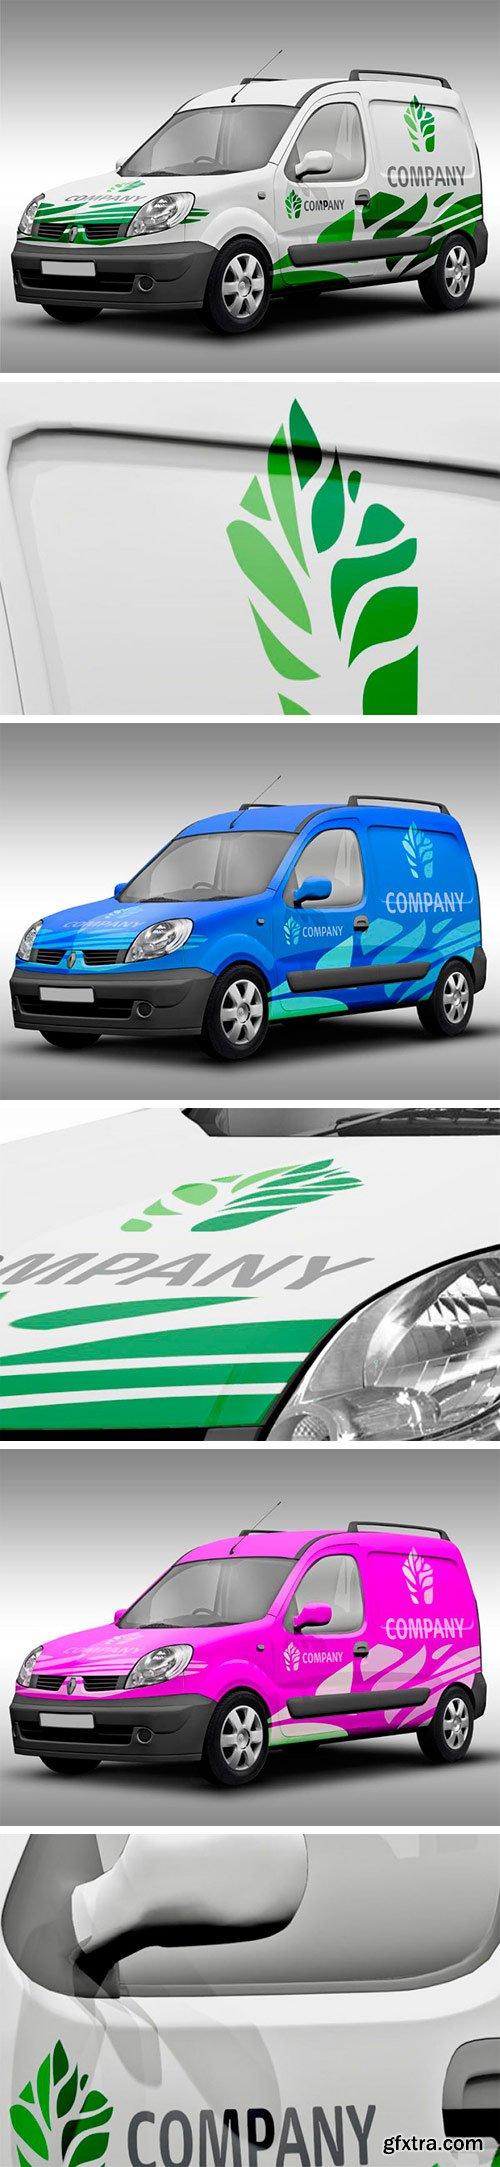 Thehungryjpeg - Vehicle Branding Mockup 82989